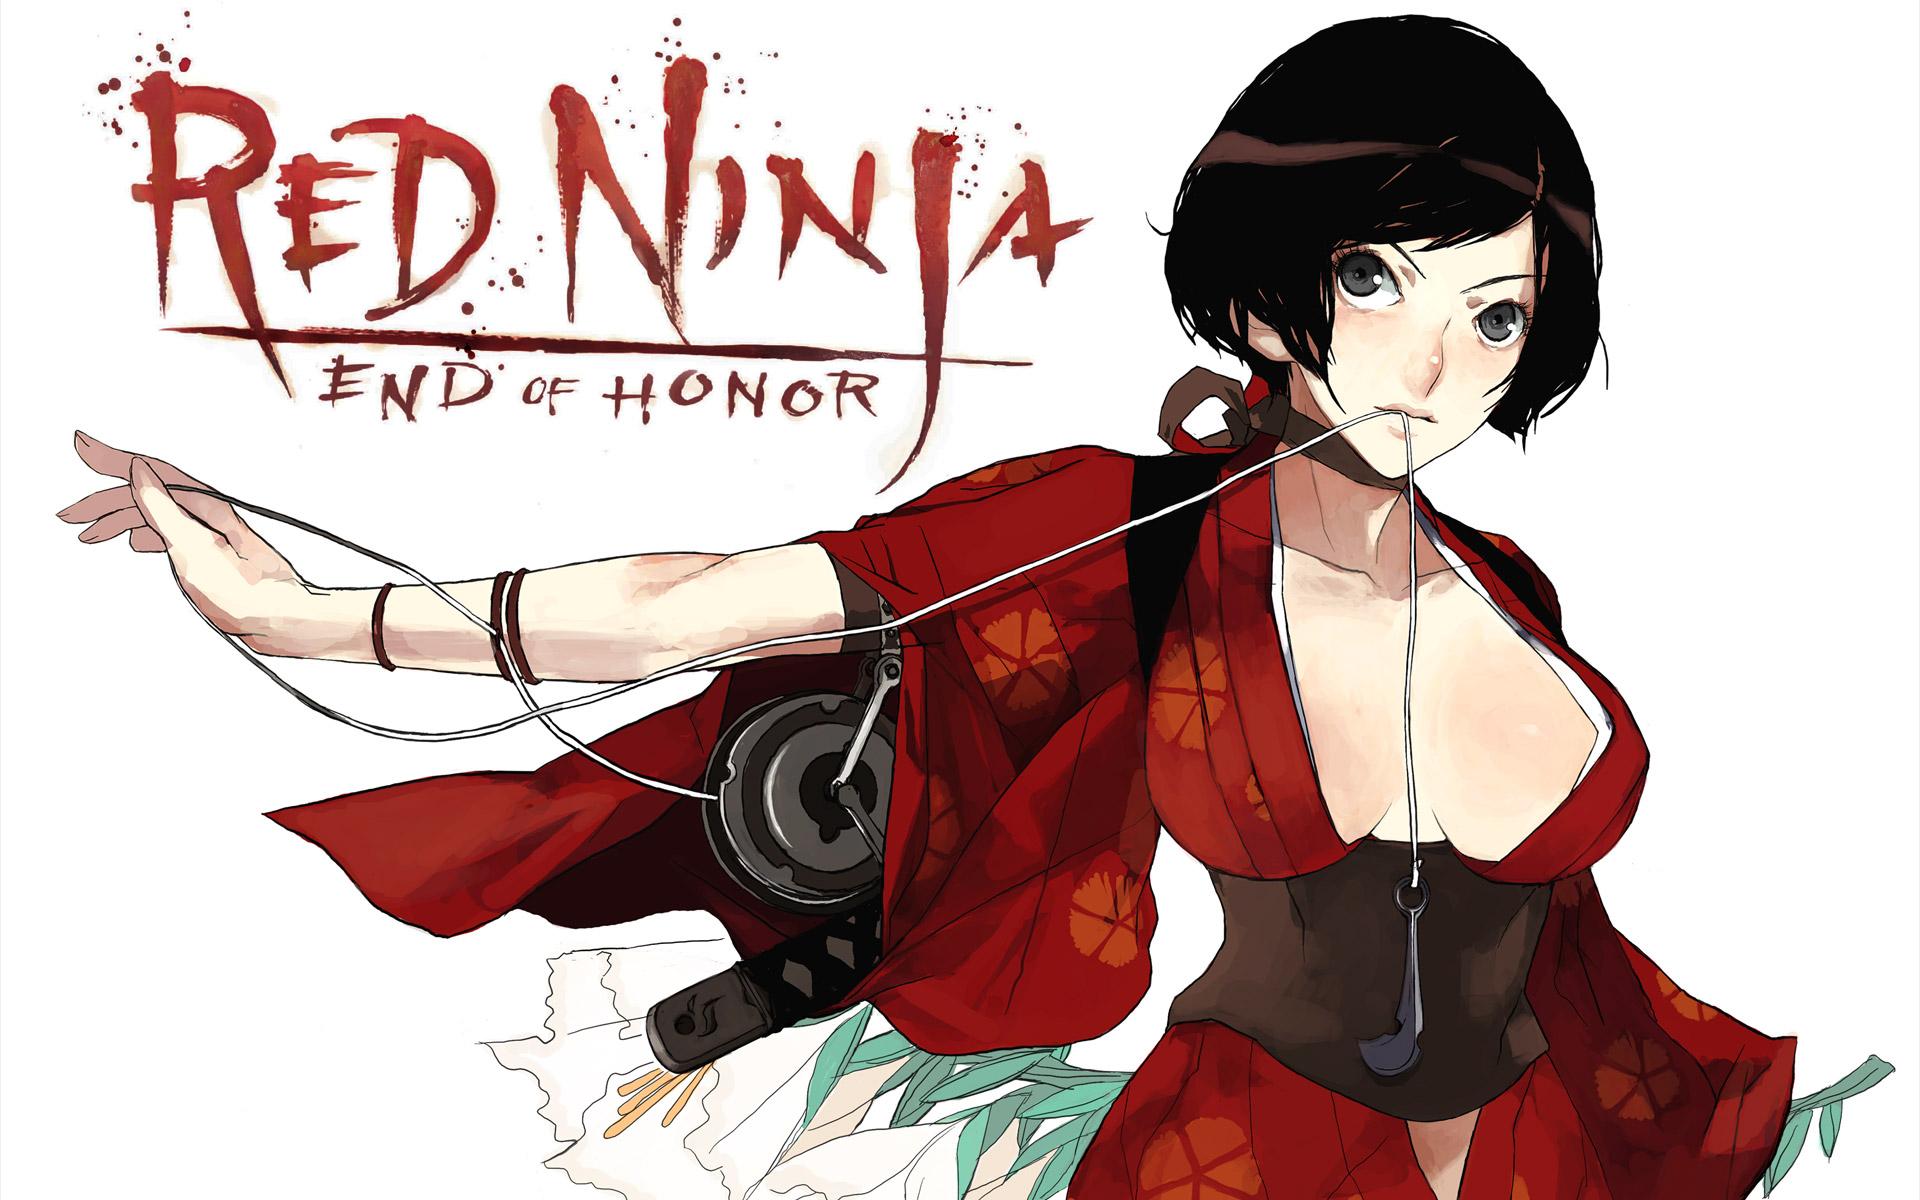 Ps2 red ninja nude nude curvy girl